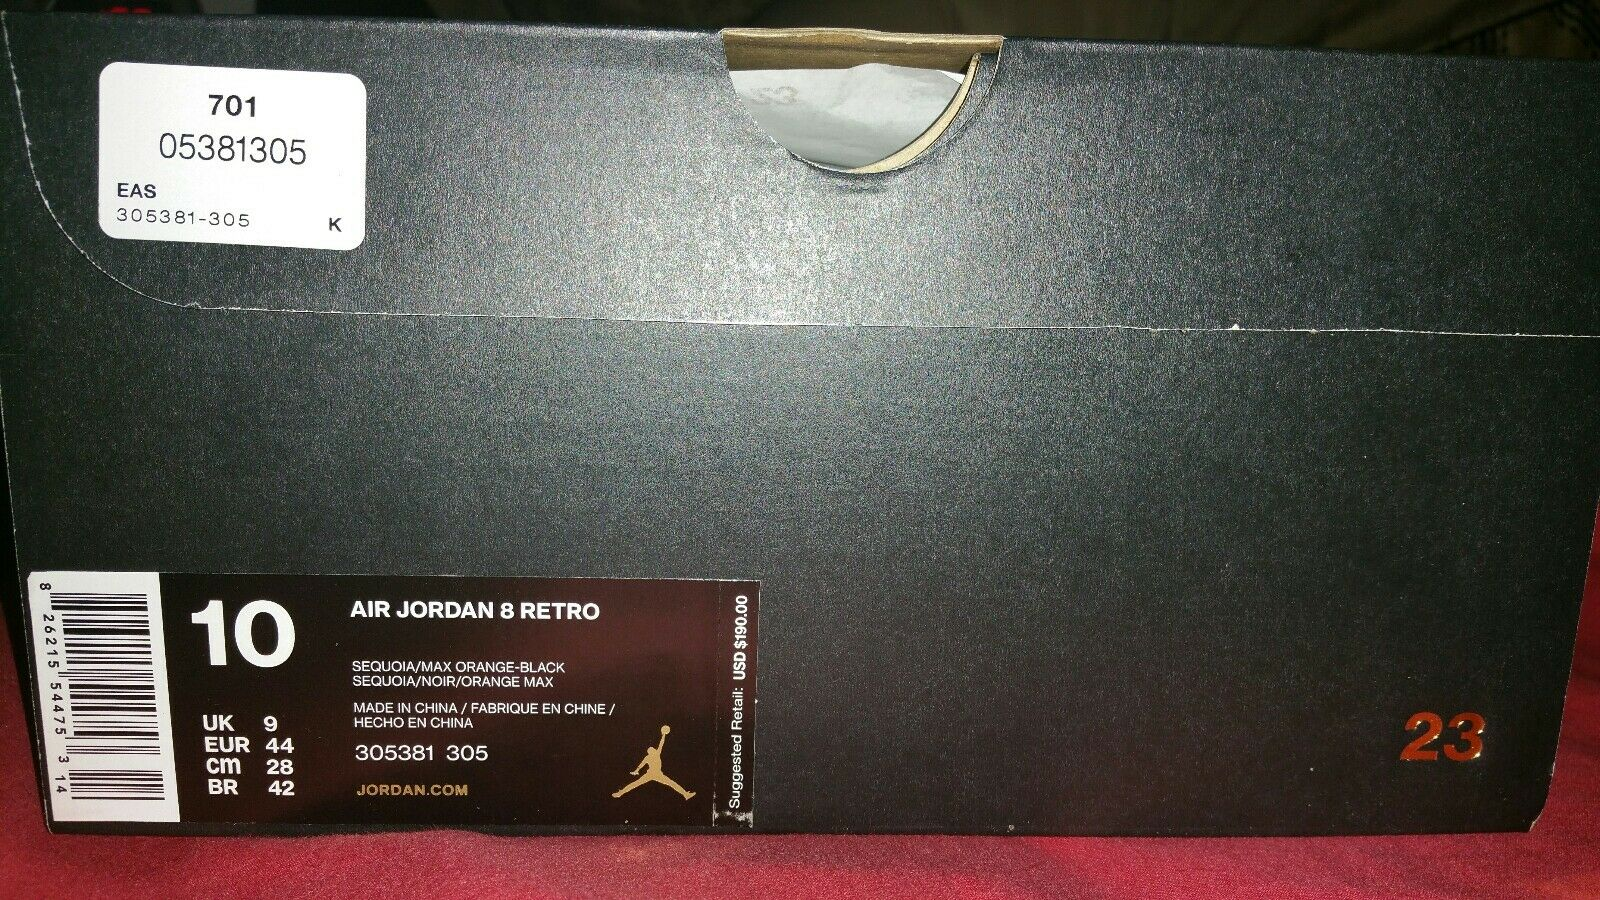 Nike air jordan retrò sz 10 8 8 8 f10c78